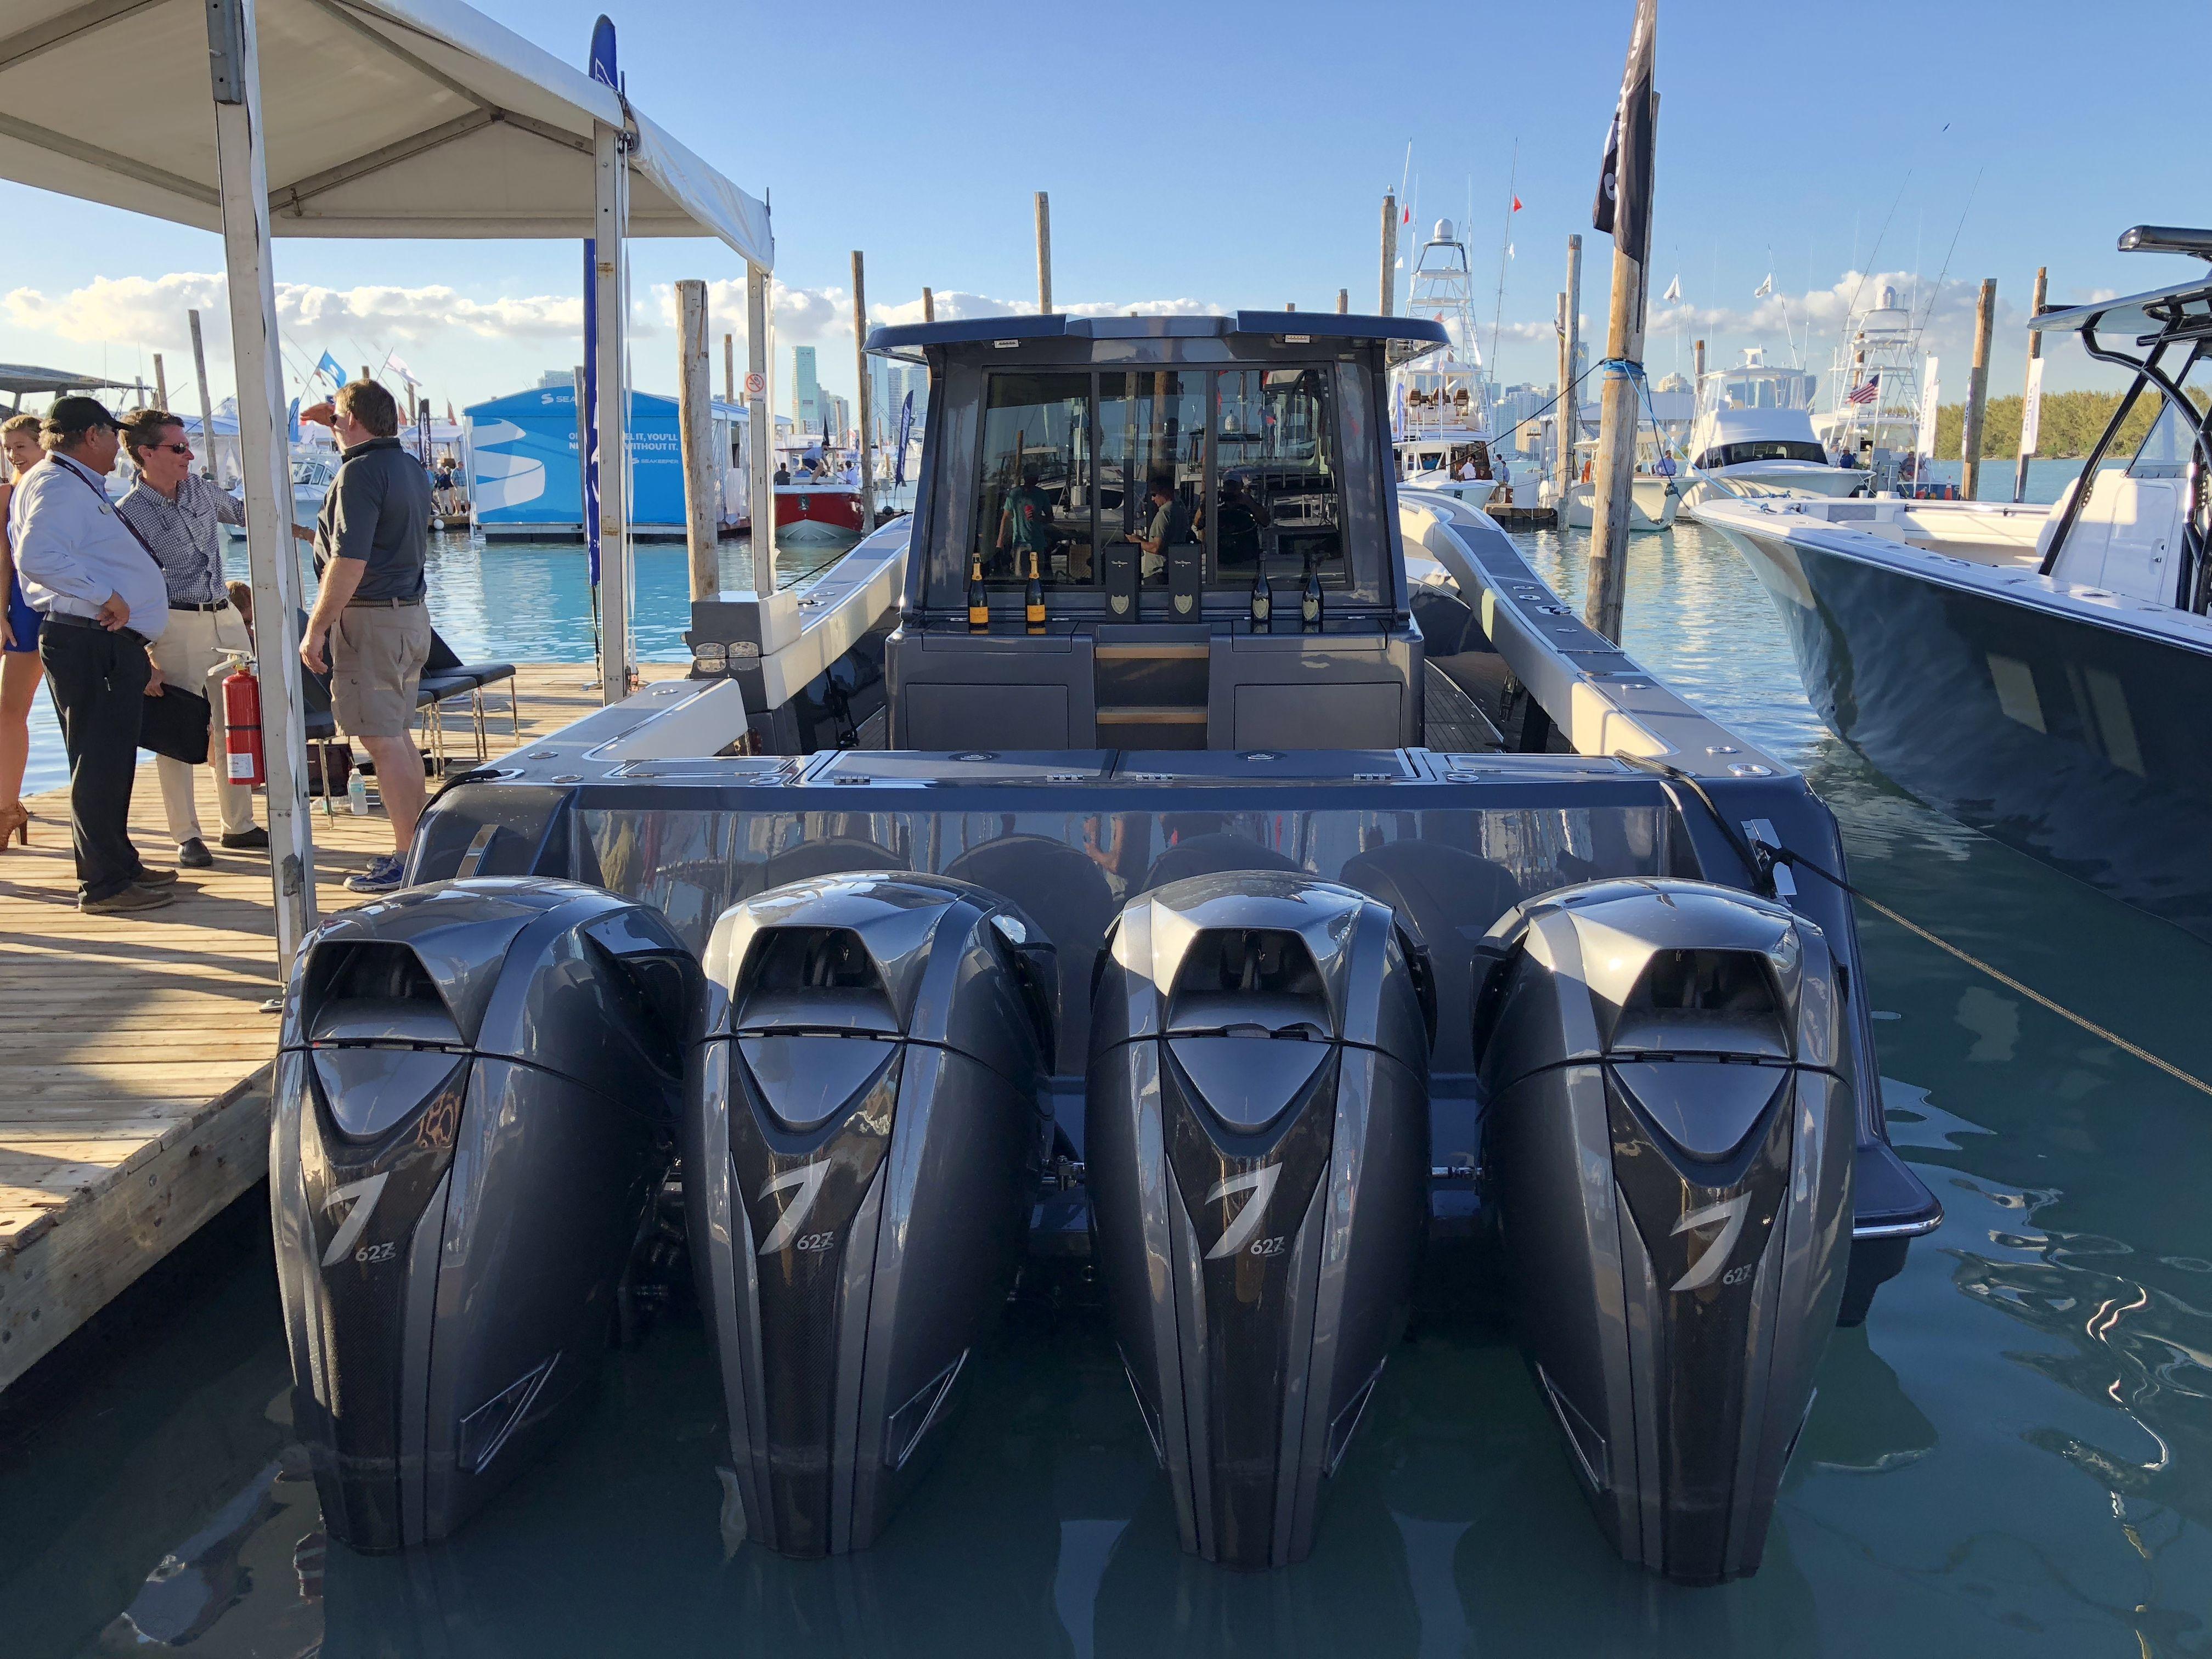 Shore Power Case Boat Yacht Rib RV Camper